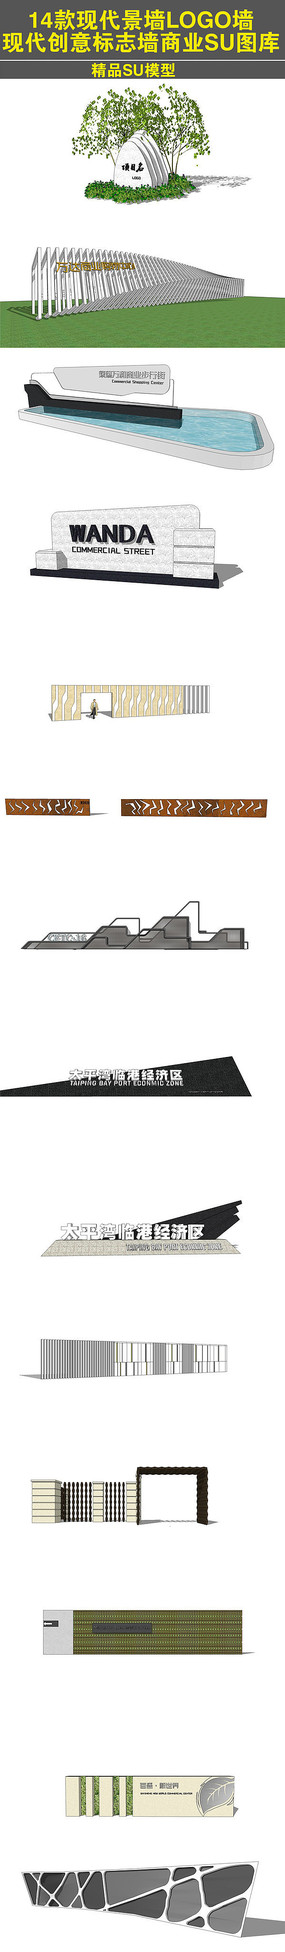 LOGO墙现代创意标志墙